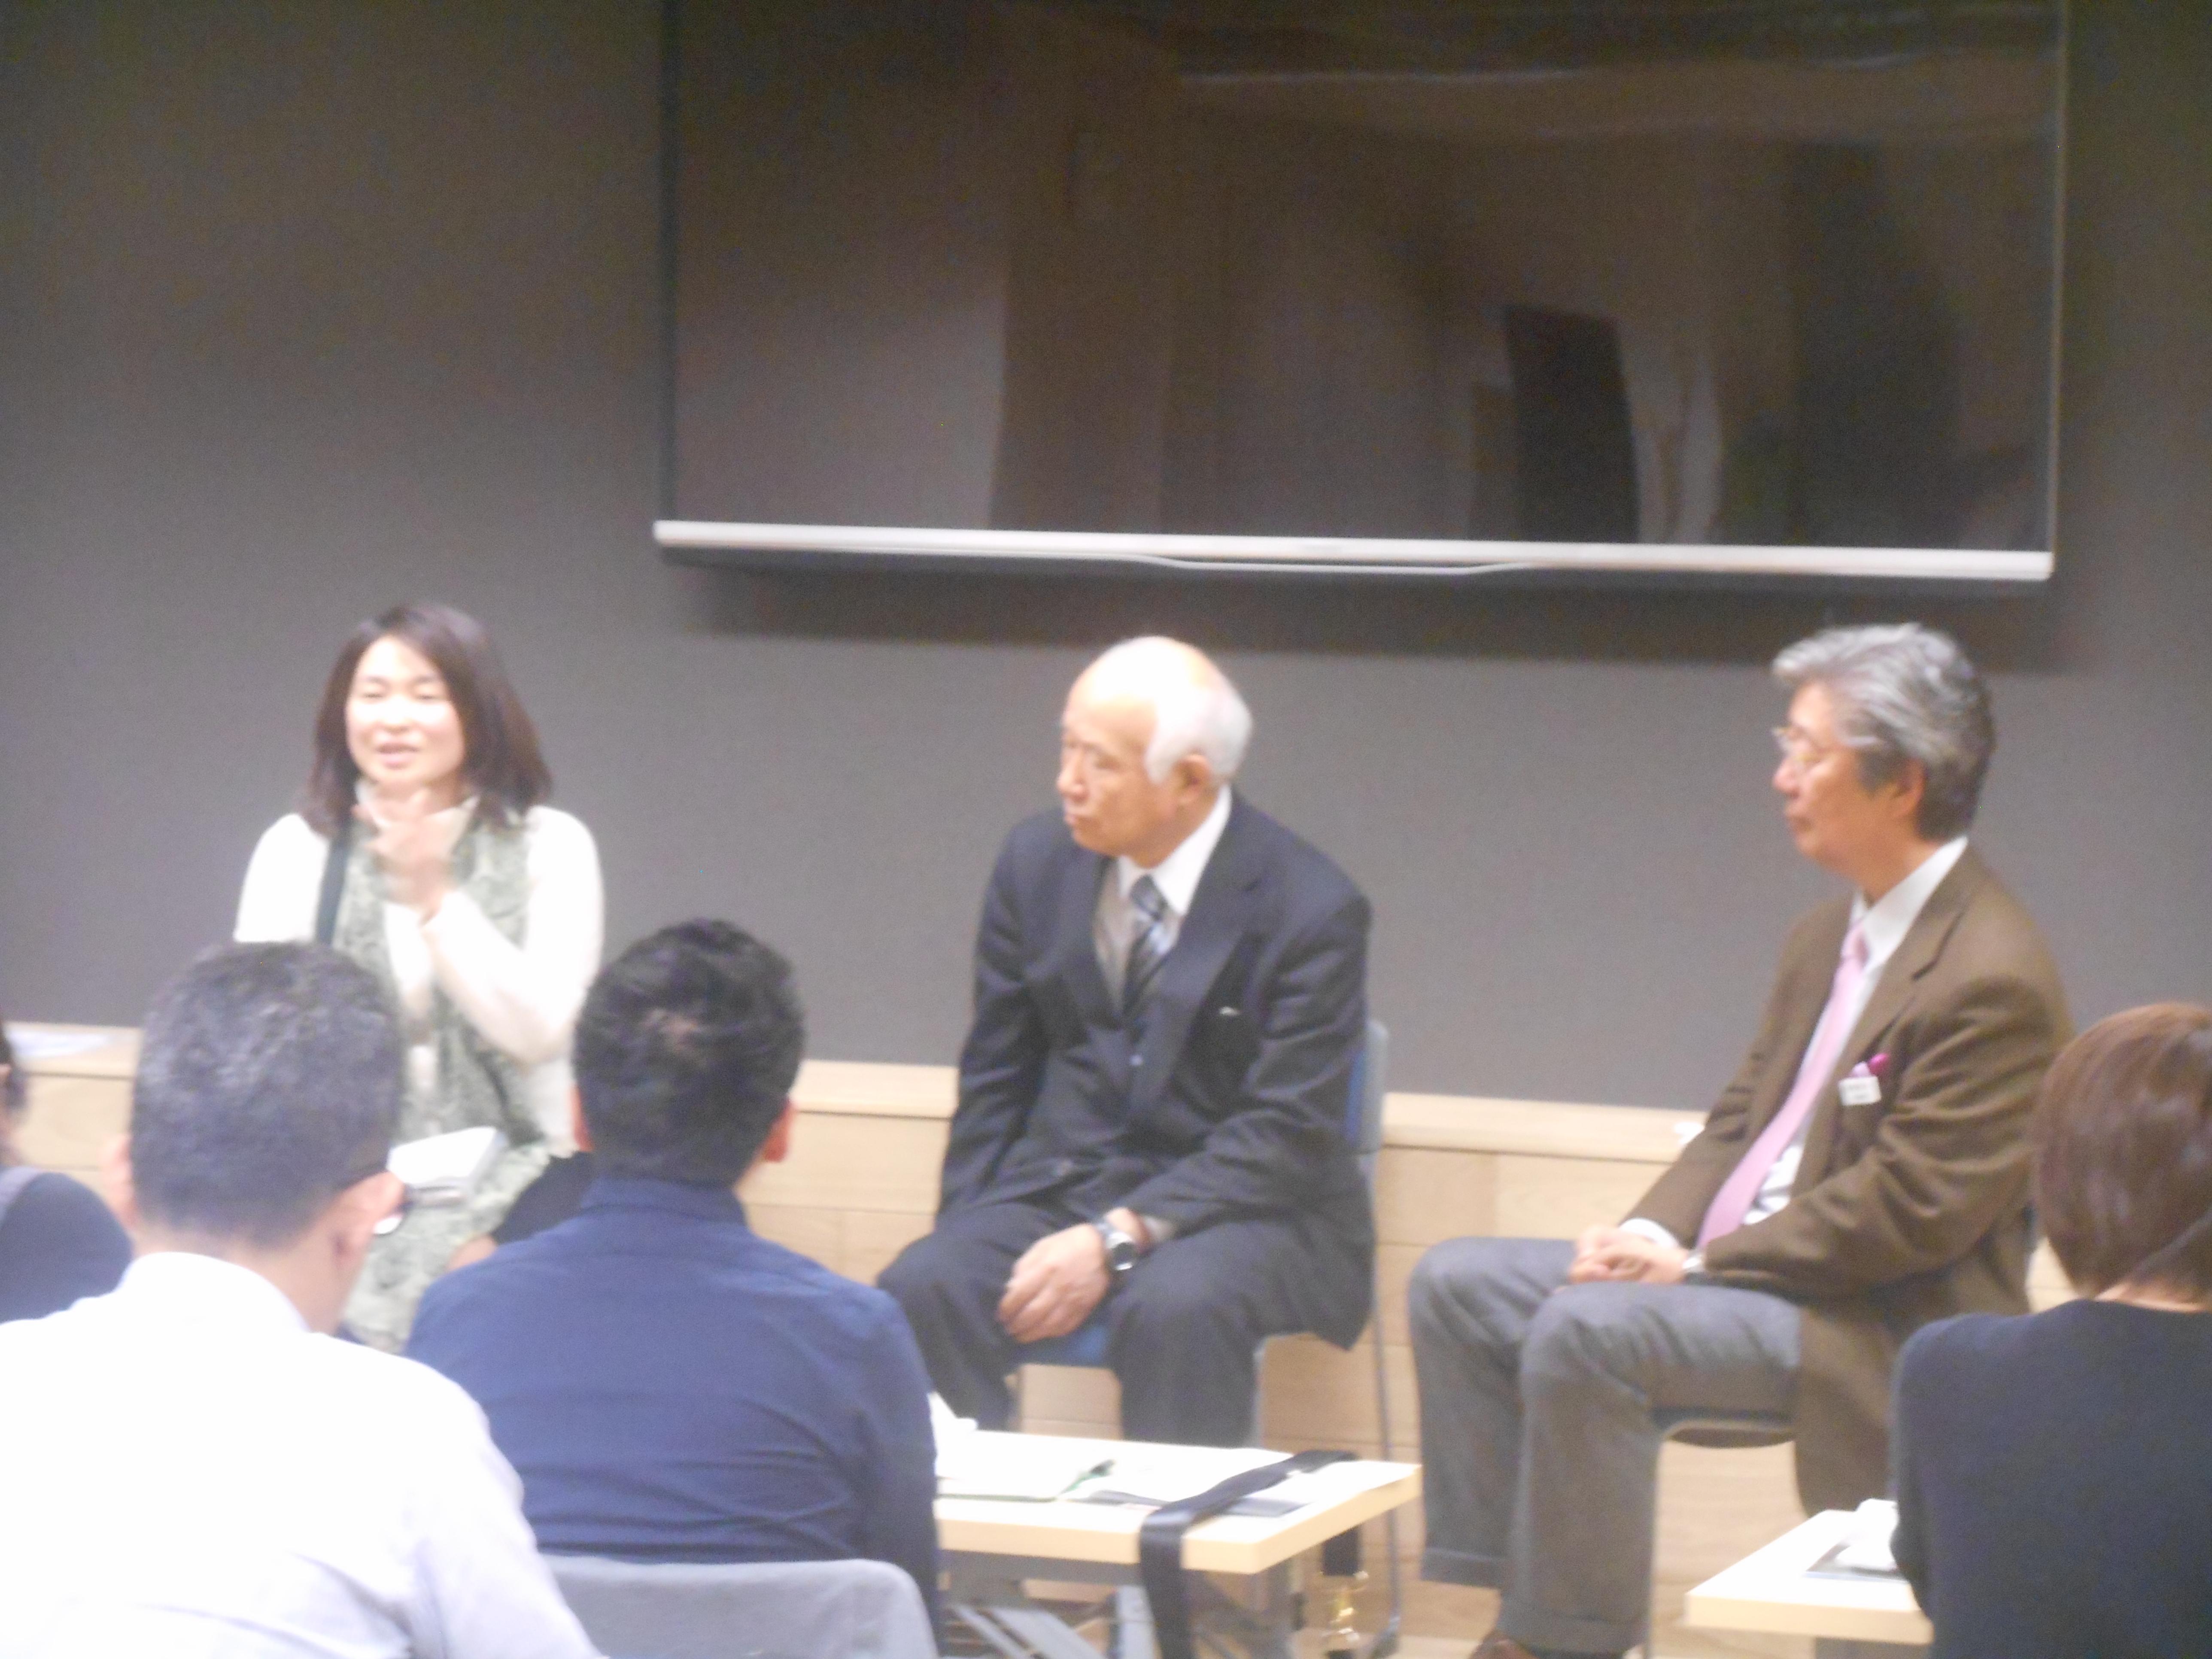 DSCN0497 - 平成30年度 東京思風塾 4月7日(土)「時代が問題をつくり、問題が人物をつくる」